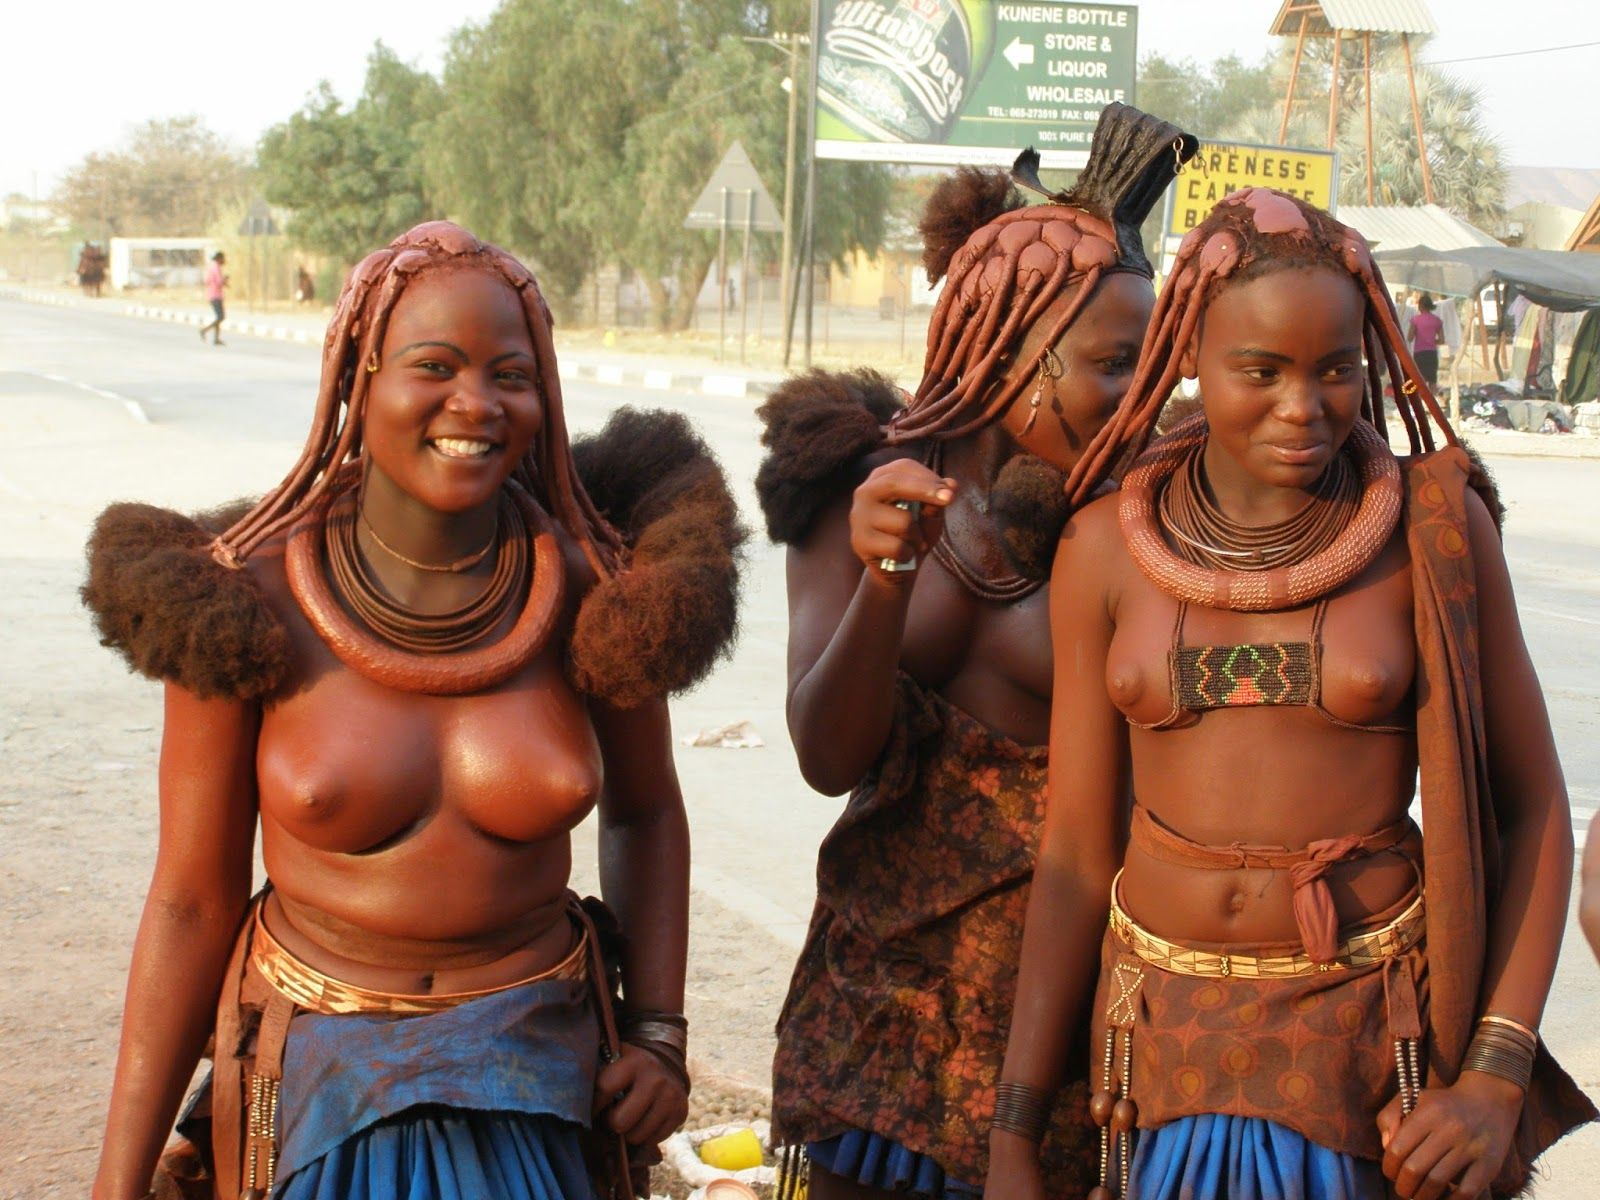 Africanas Videos Porno sex video africana - singles and sex